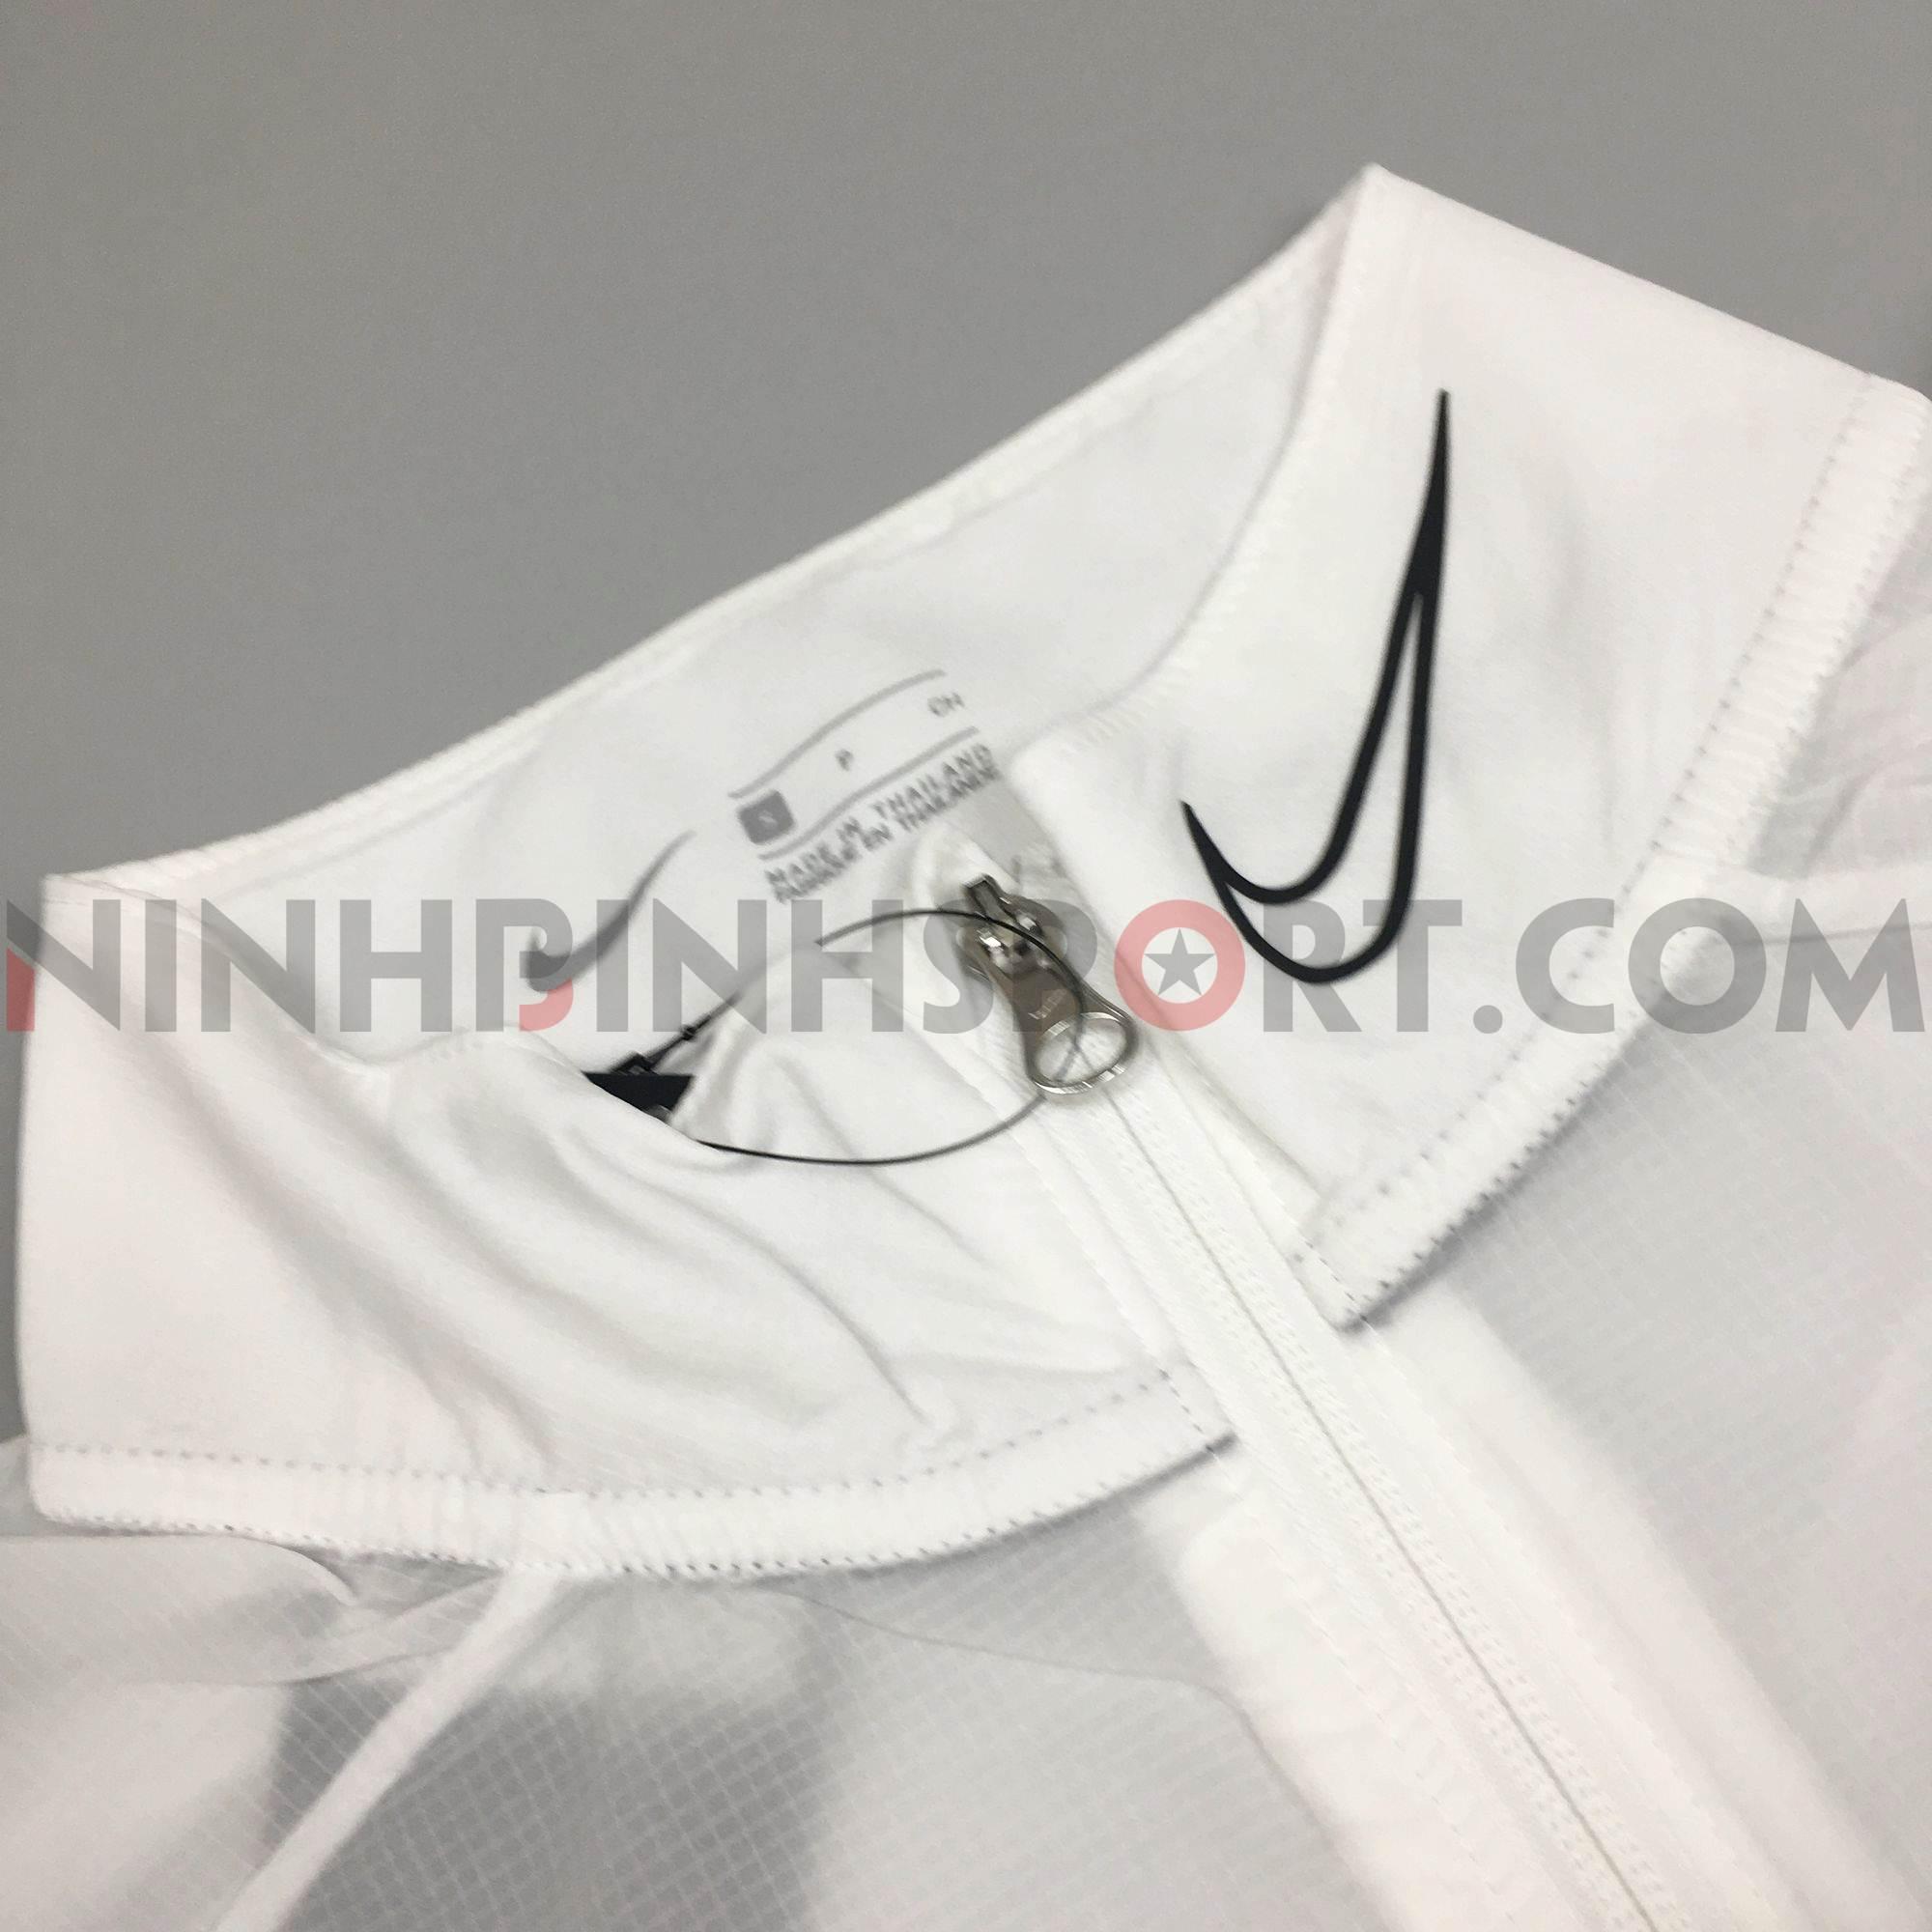 Áo khoác thể thao nam Nike Academy Jacket BQ7346-100